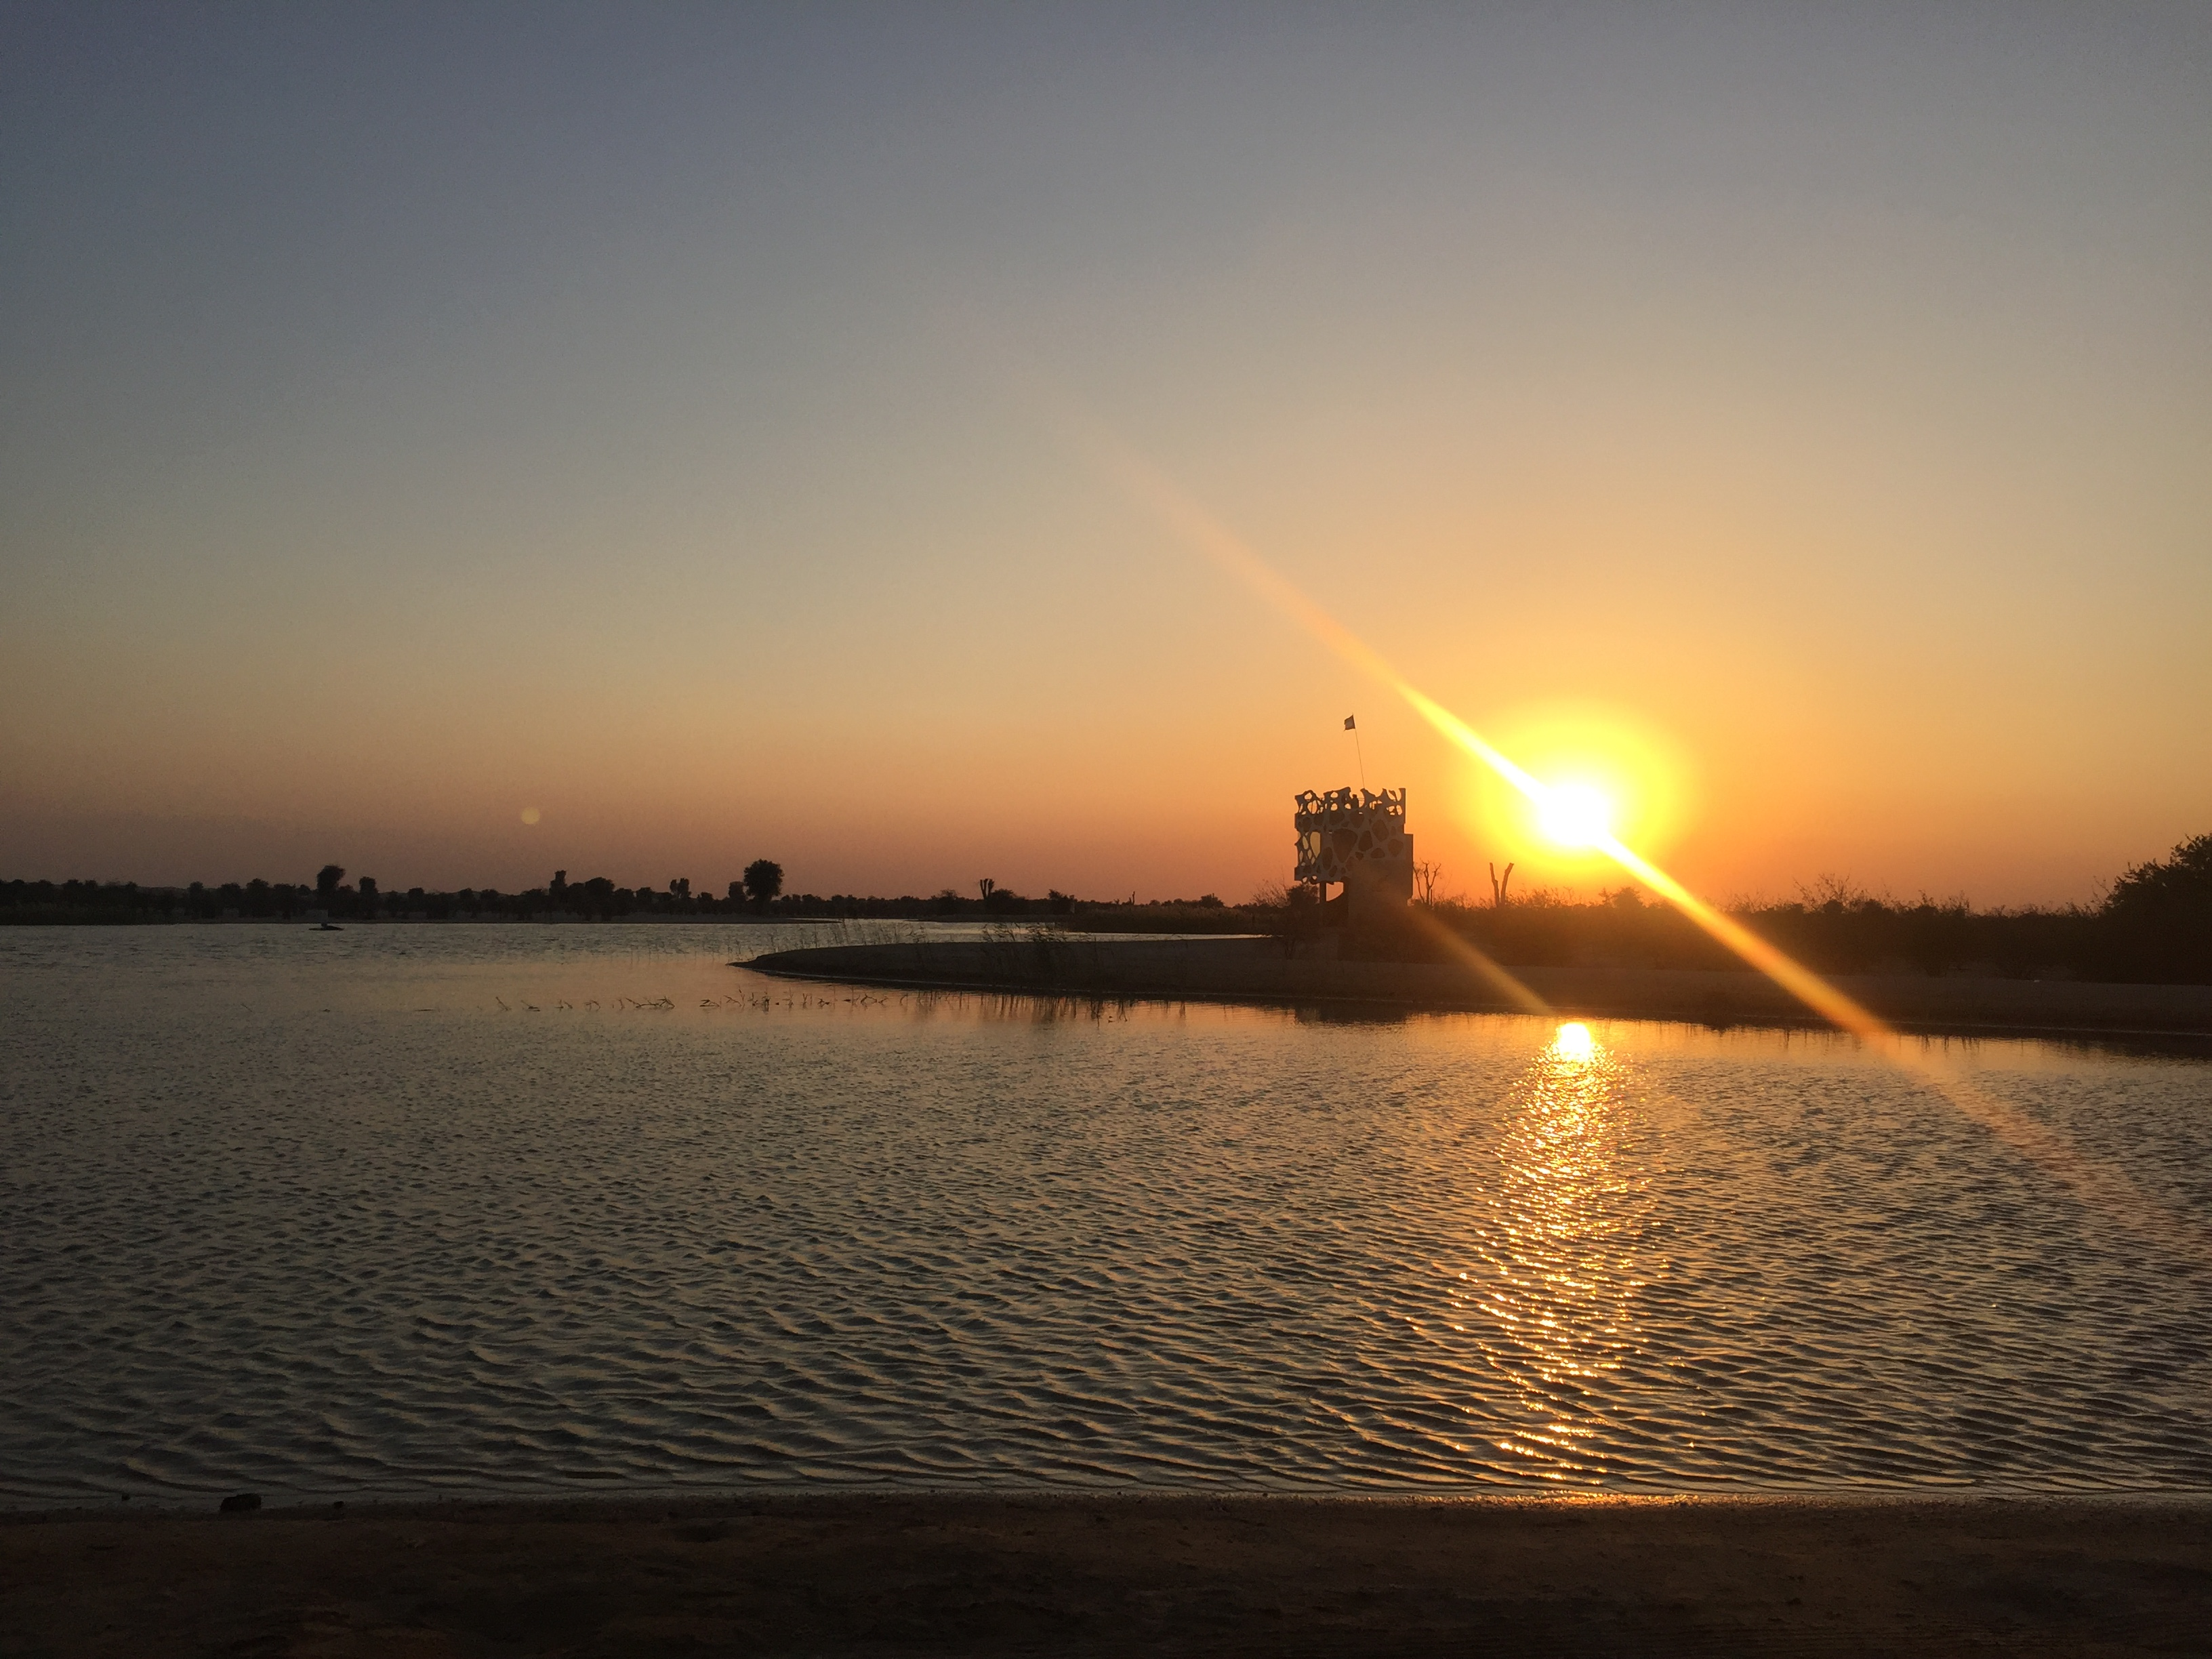 sunset at the desert Oasis